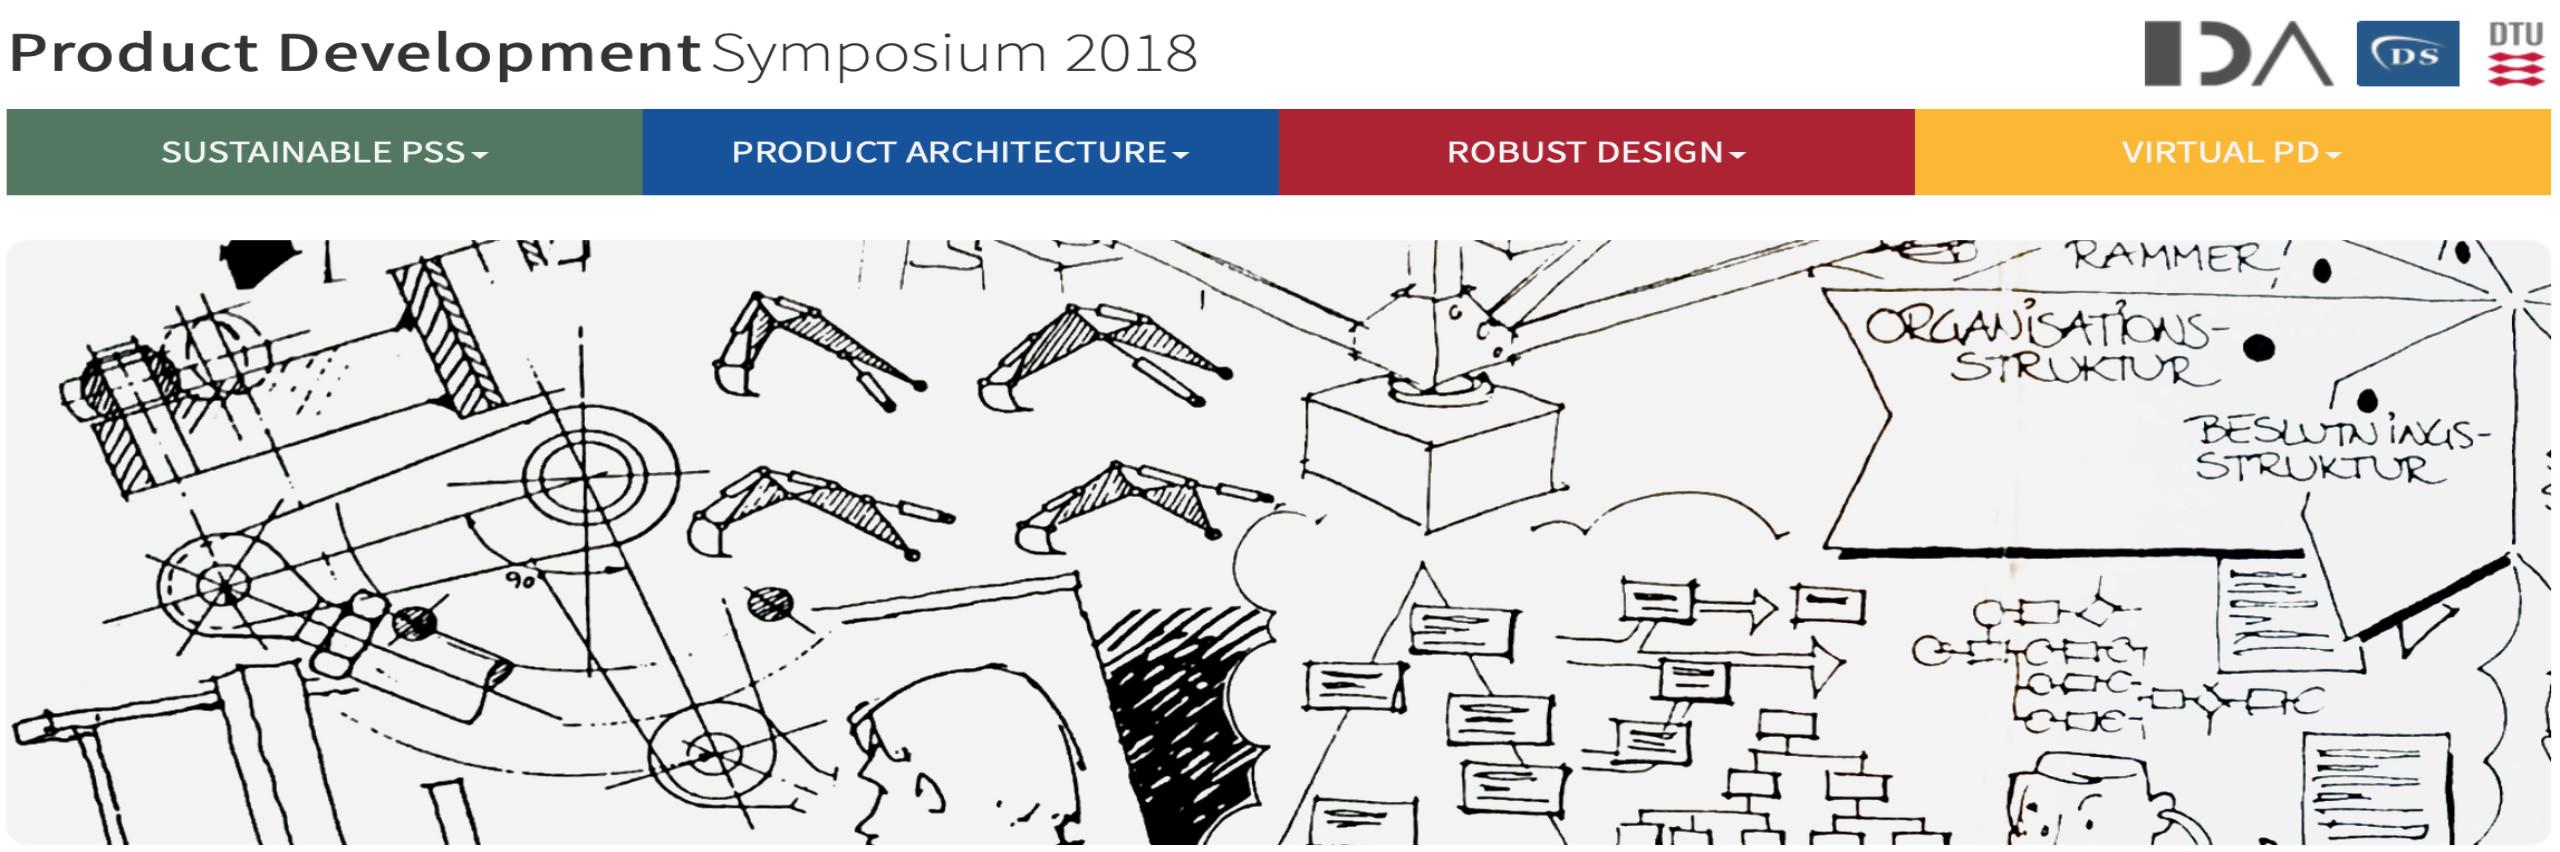 Product Development Symposium 2018